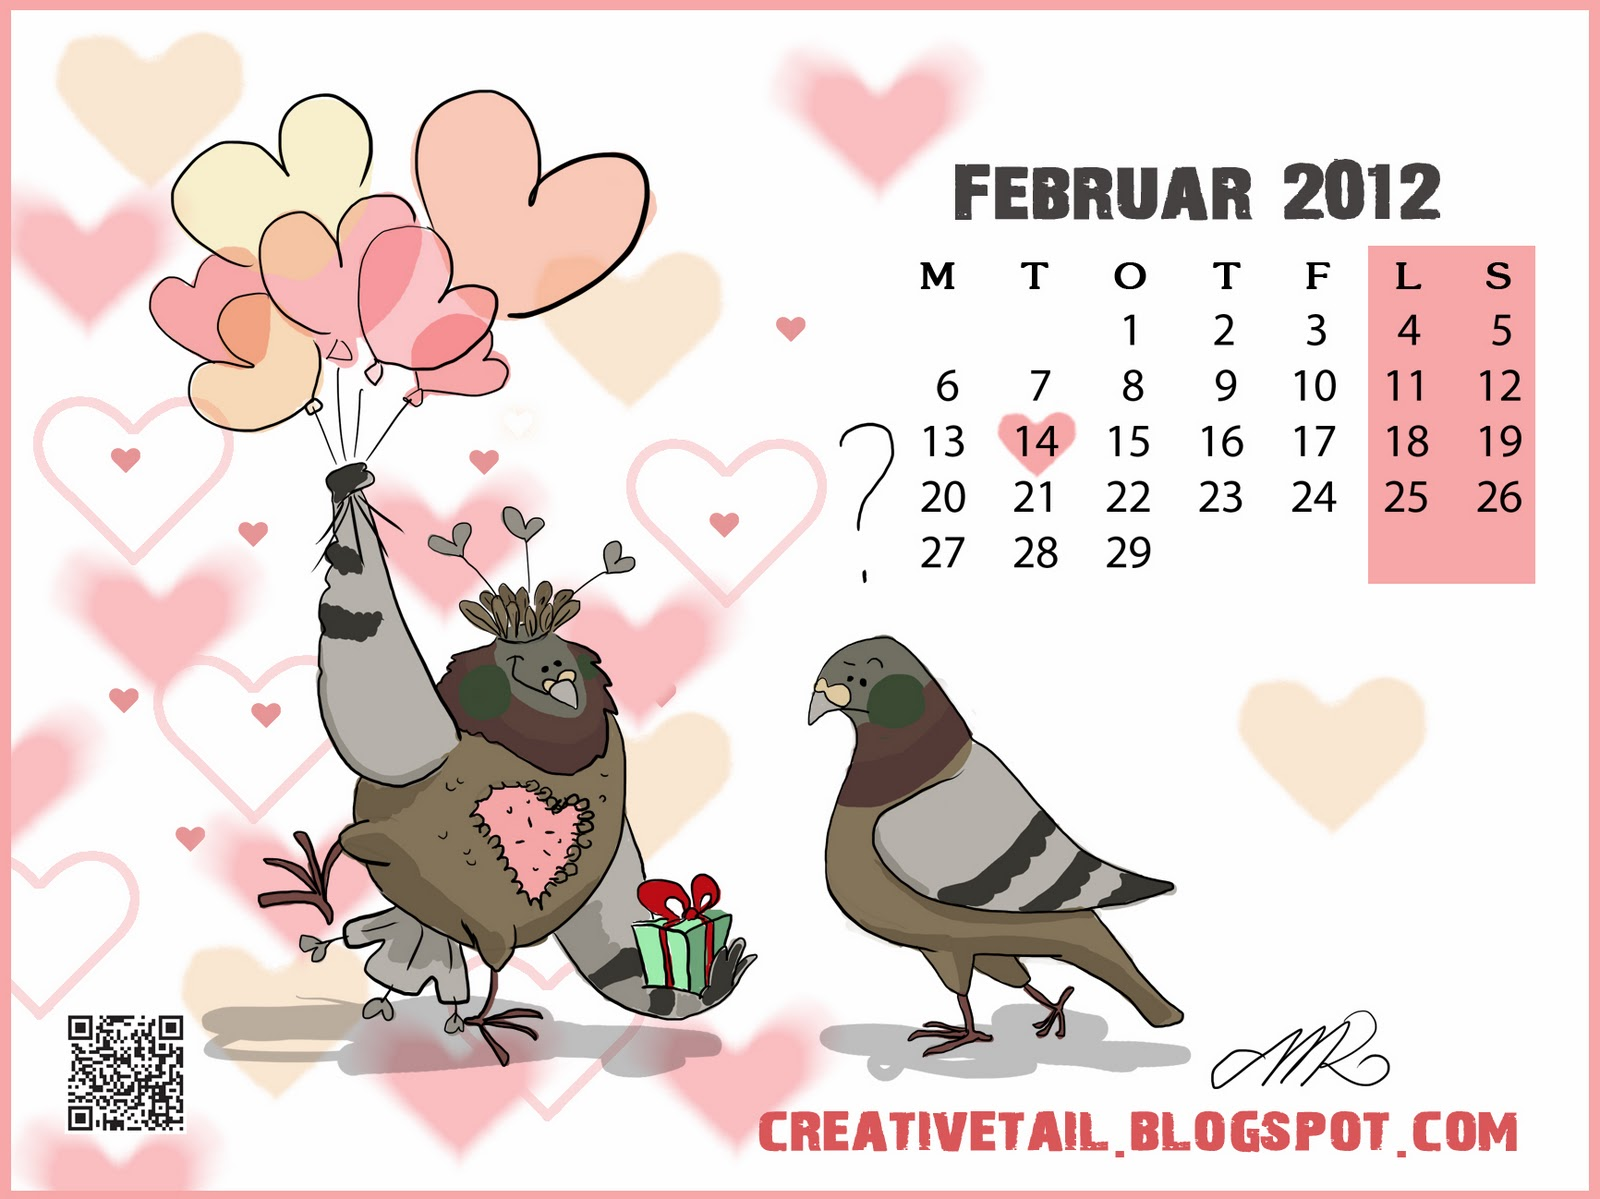 http://4.bp.blogspot.com/-Q6BC5V8YcpE/TyfS0iQzLRI/AAAAAAAADhk/EbGY0QTOYFs/s1600/Kalender_2012_februar.jpg